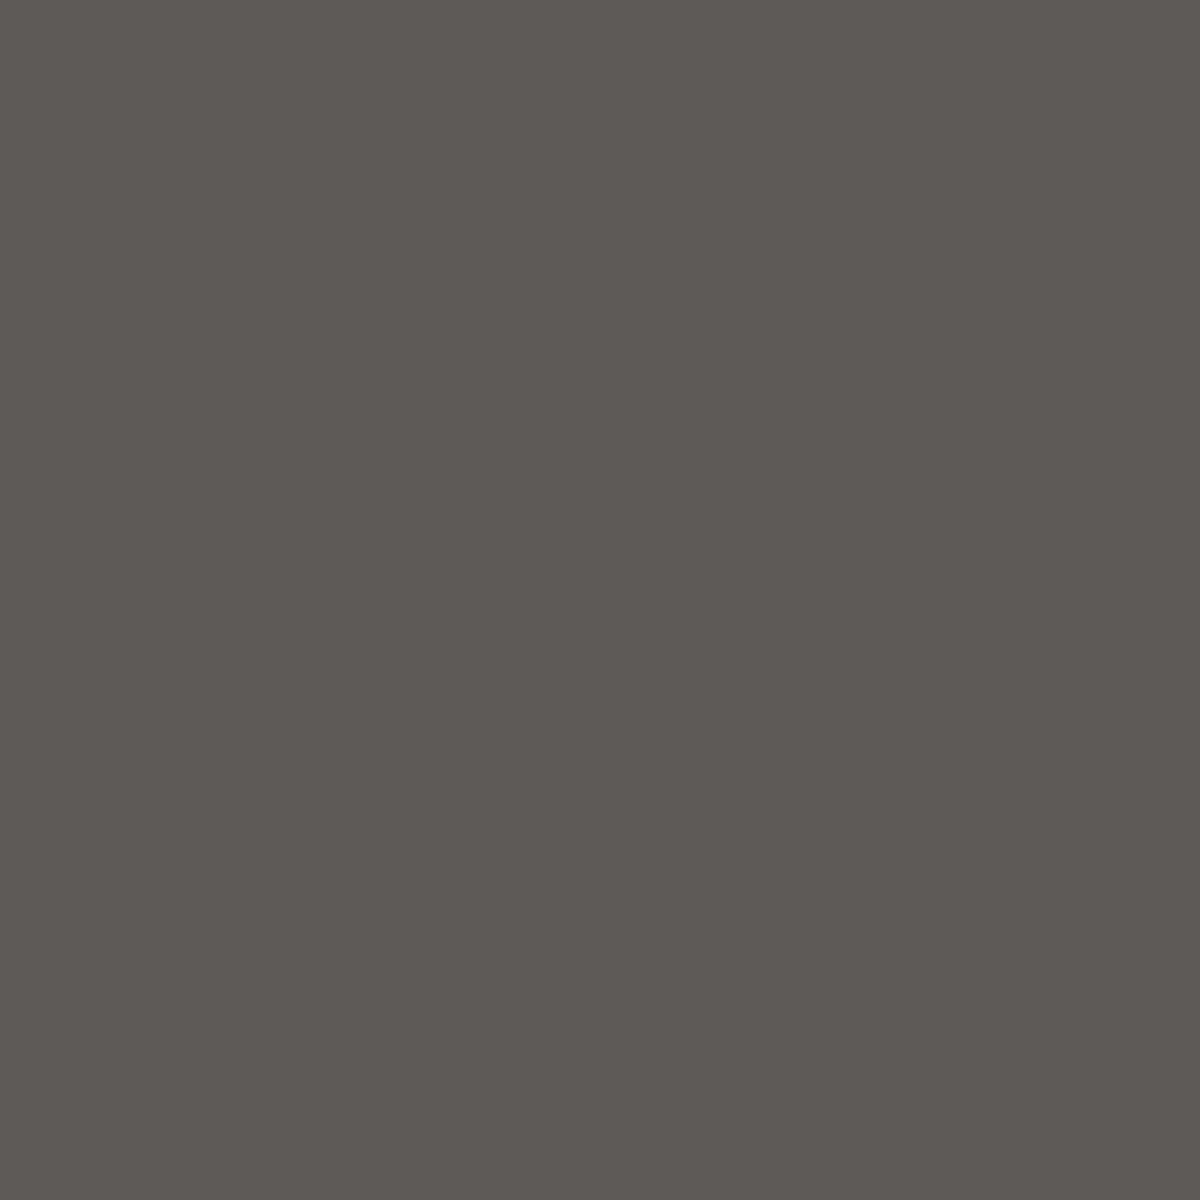 ORGANIC LINE  - PIGMENT GRAPHITE ORGANICLINE AMIEA